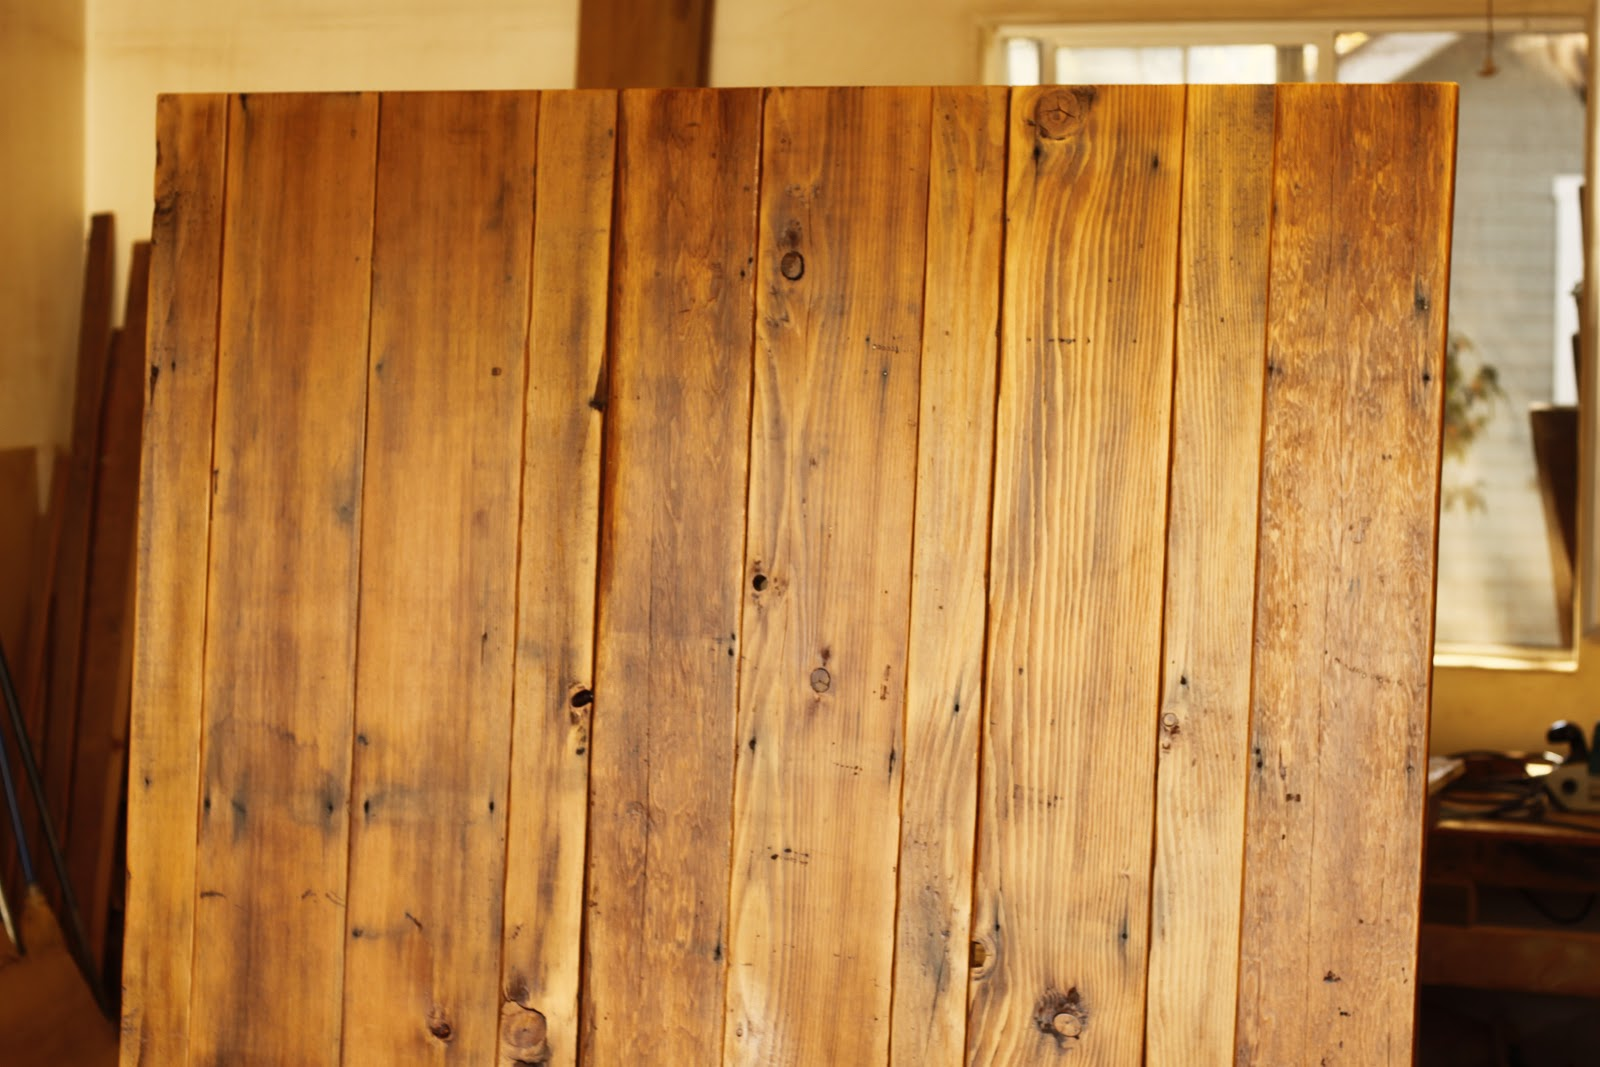 Arbor exchange reclaimed wood furniture reclaimed wood Reclaimed wood furniture austin tx